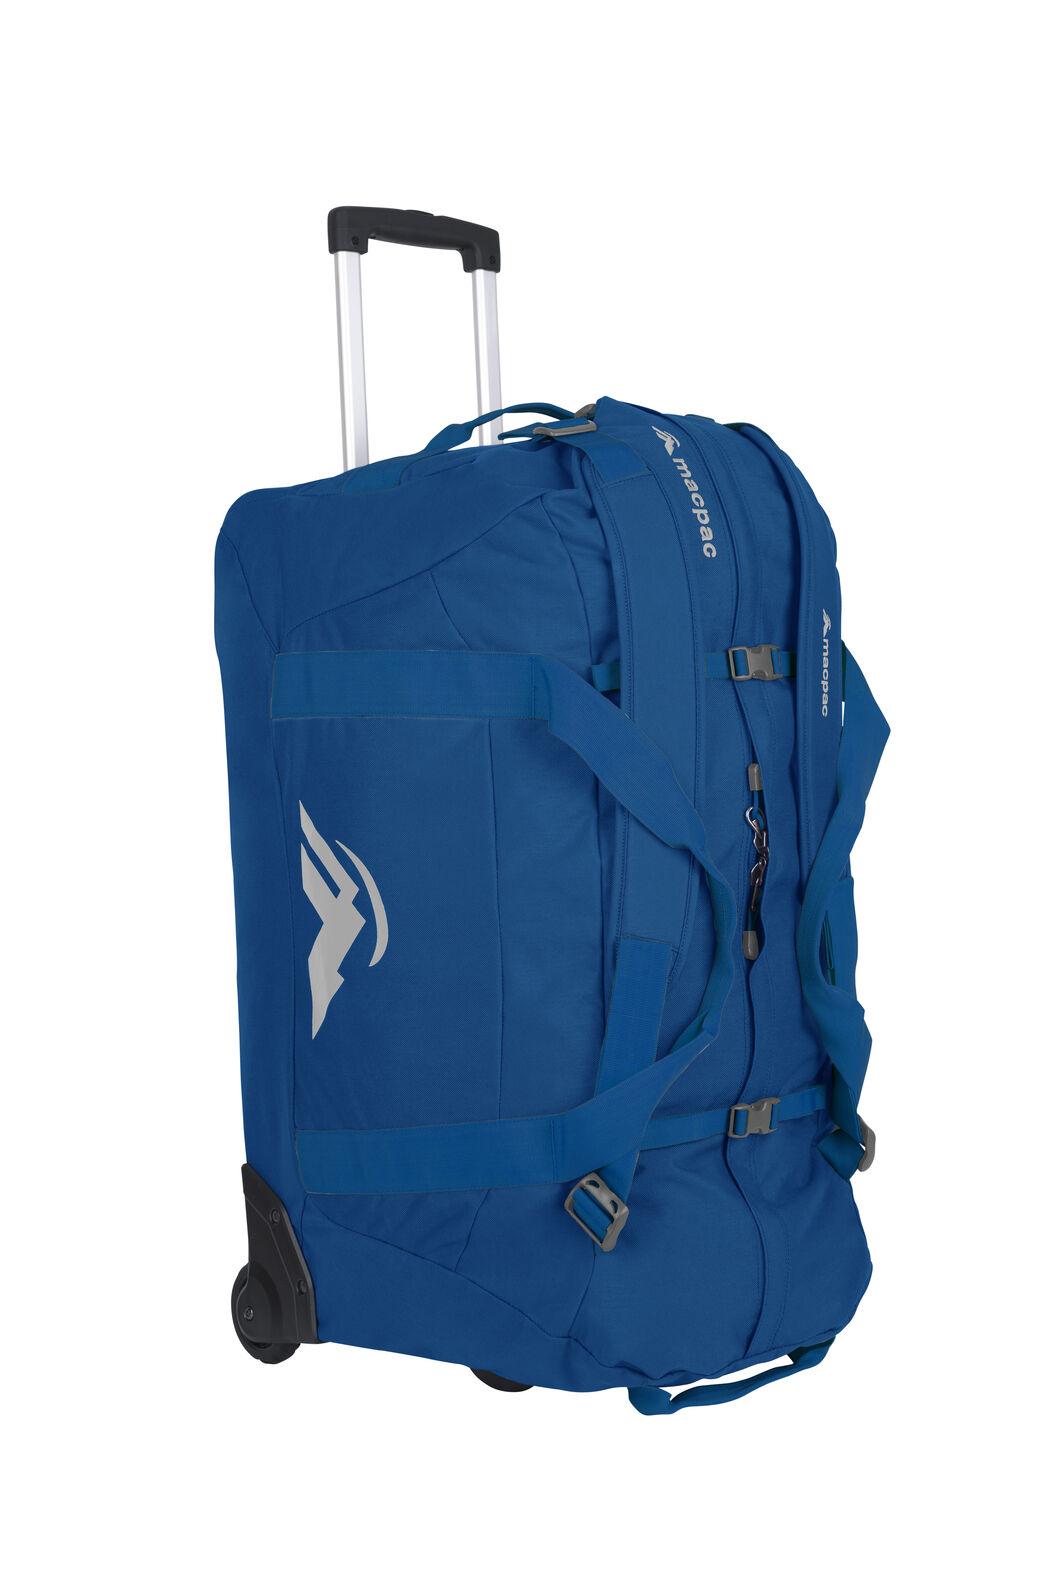 Macpac 120L Wheeled Duffel Bag, Victoria Blue, hi-res